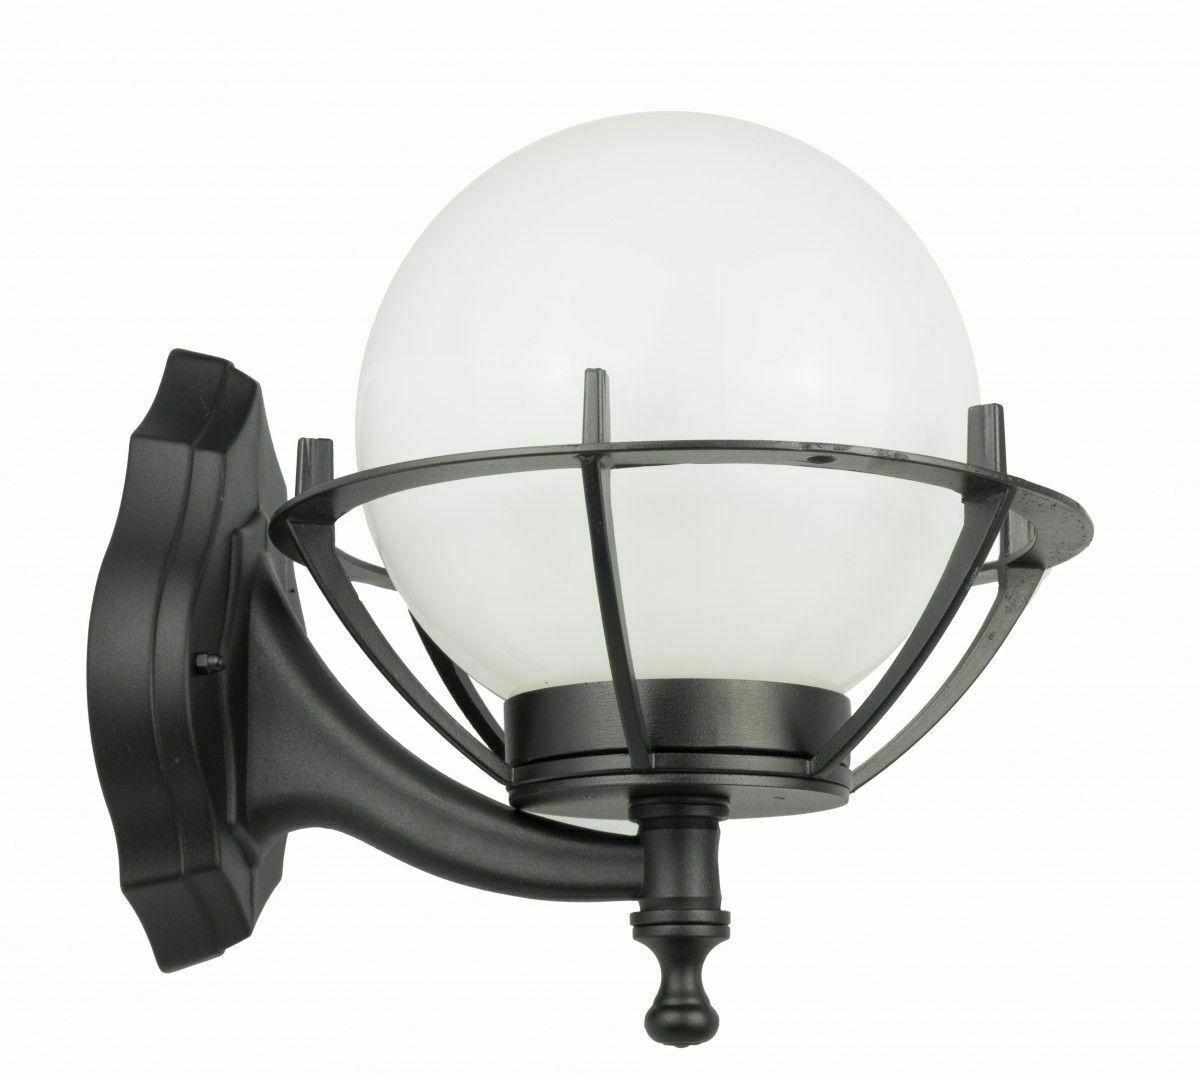 Outdoor wall lamp Kule with basket 200 K 3012/1 / KPO